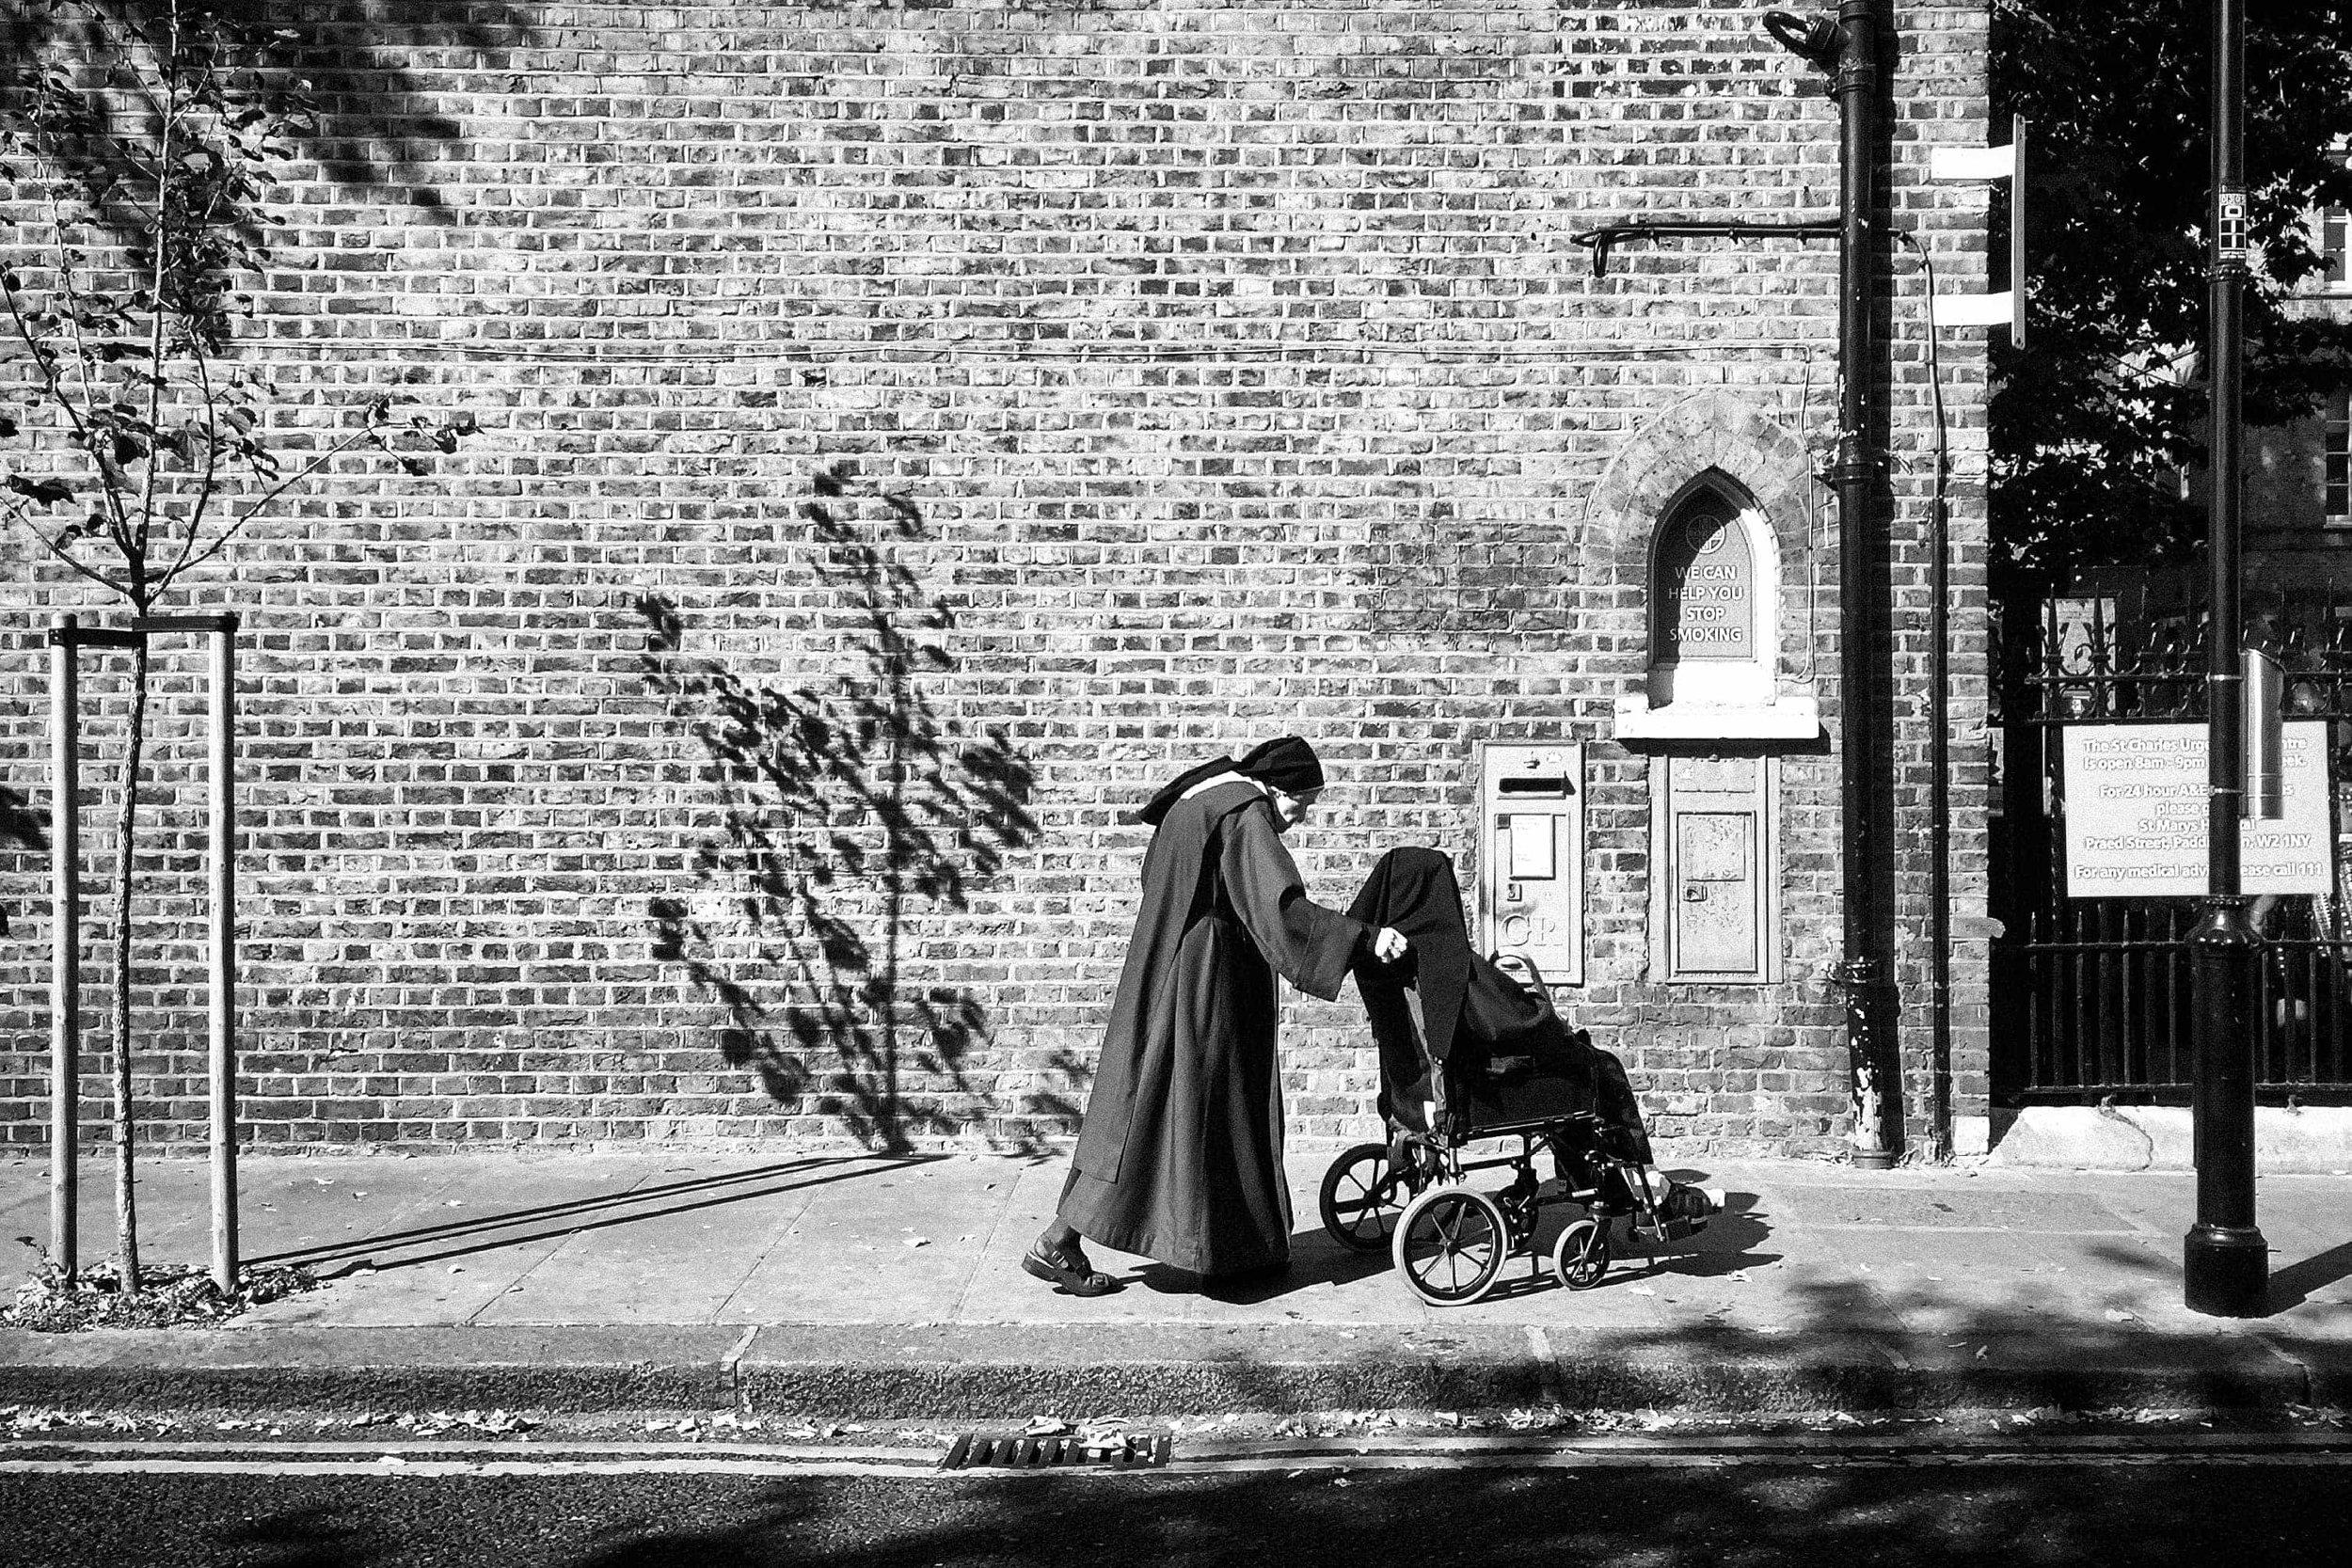 street-documentary-iphone-photography-fabio-burrelli-15.jpg